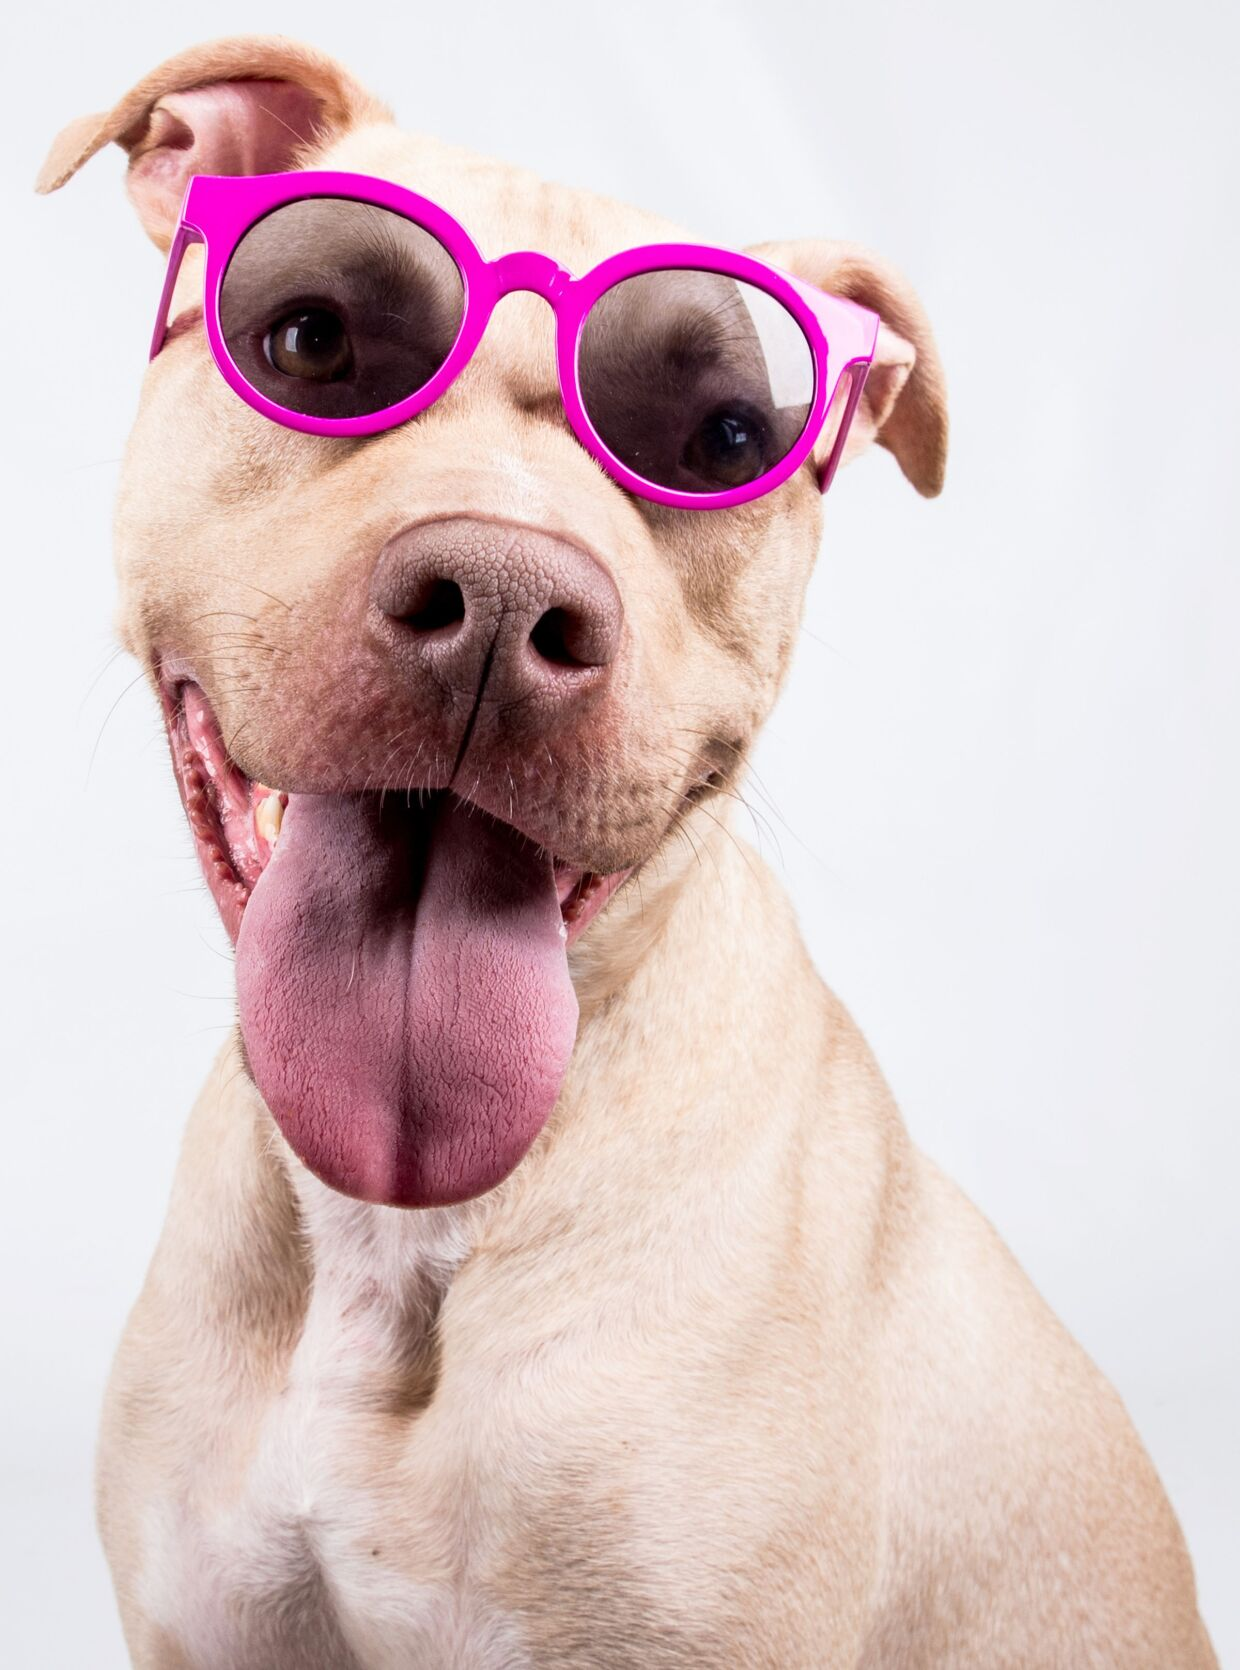 033121_MNS_LifeLine_spring_002 Kayden the dog